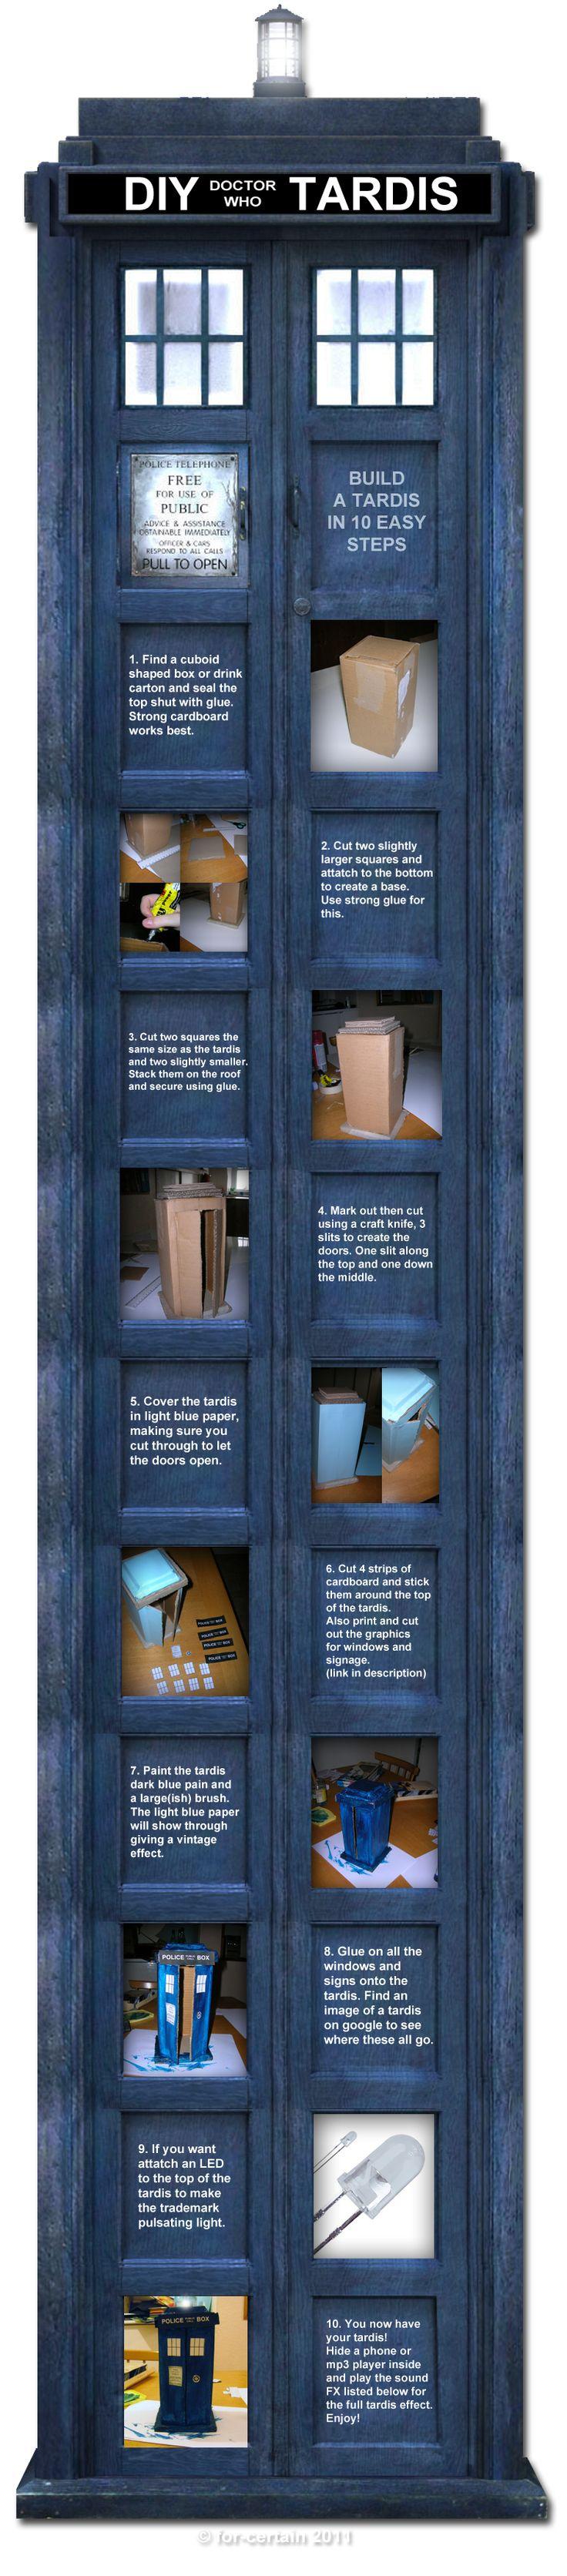 doctor who tardis diy -#main